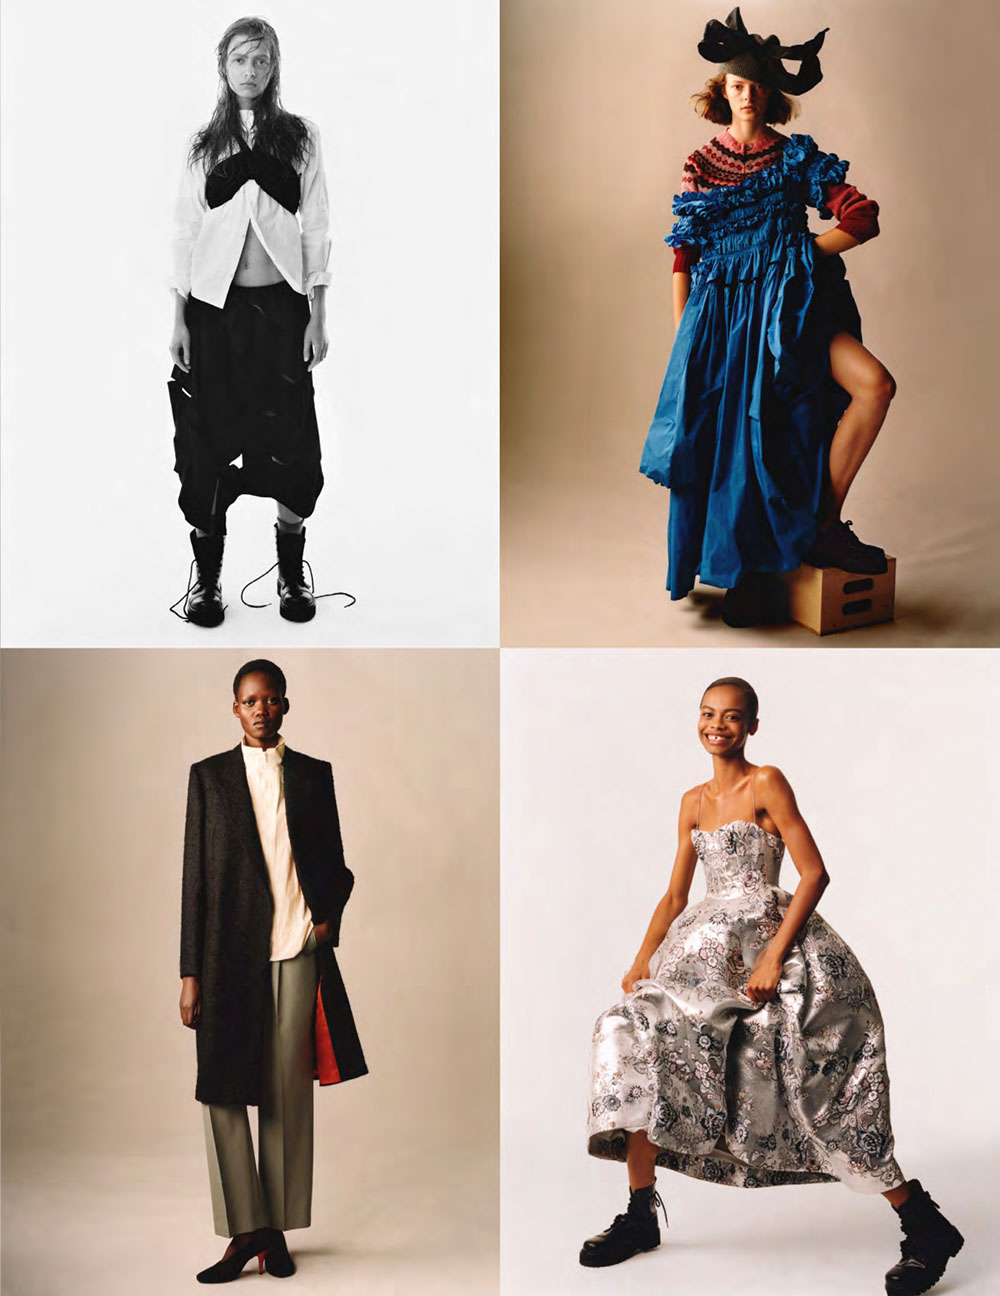 ''Brits' Spirit'' by Scott Trindle for British Vogue October 2020